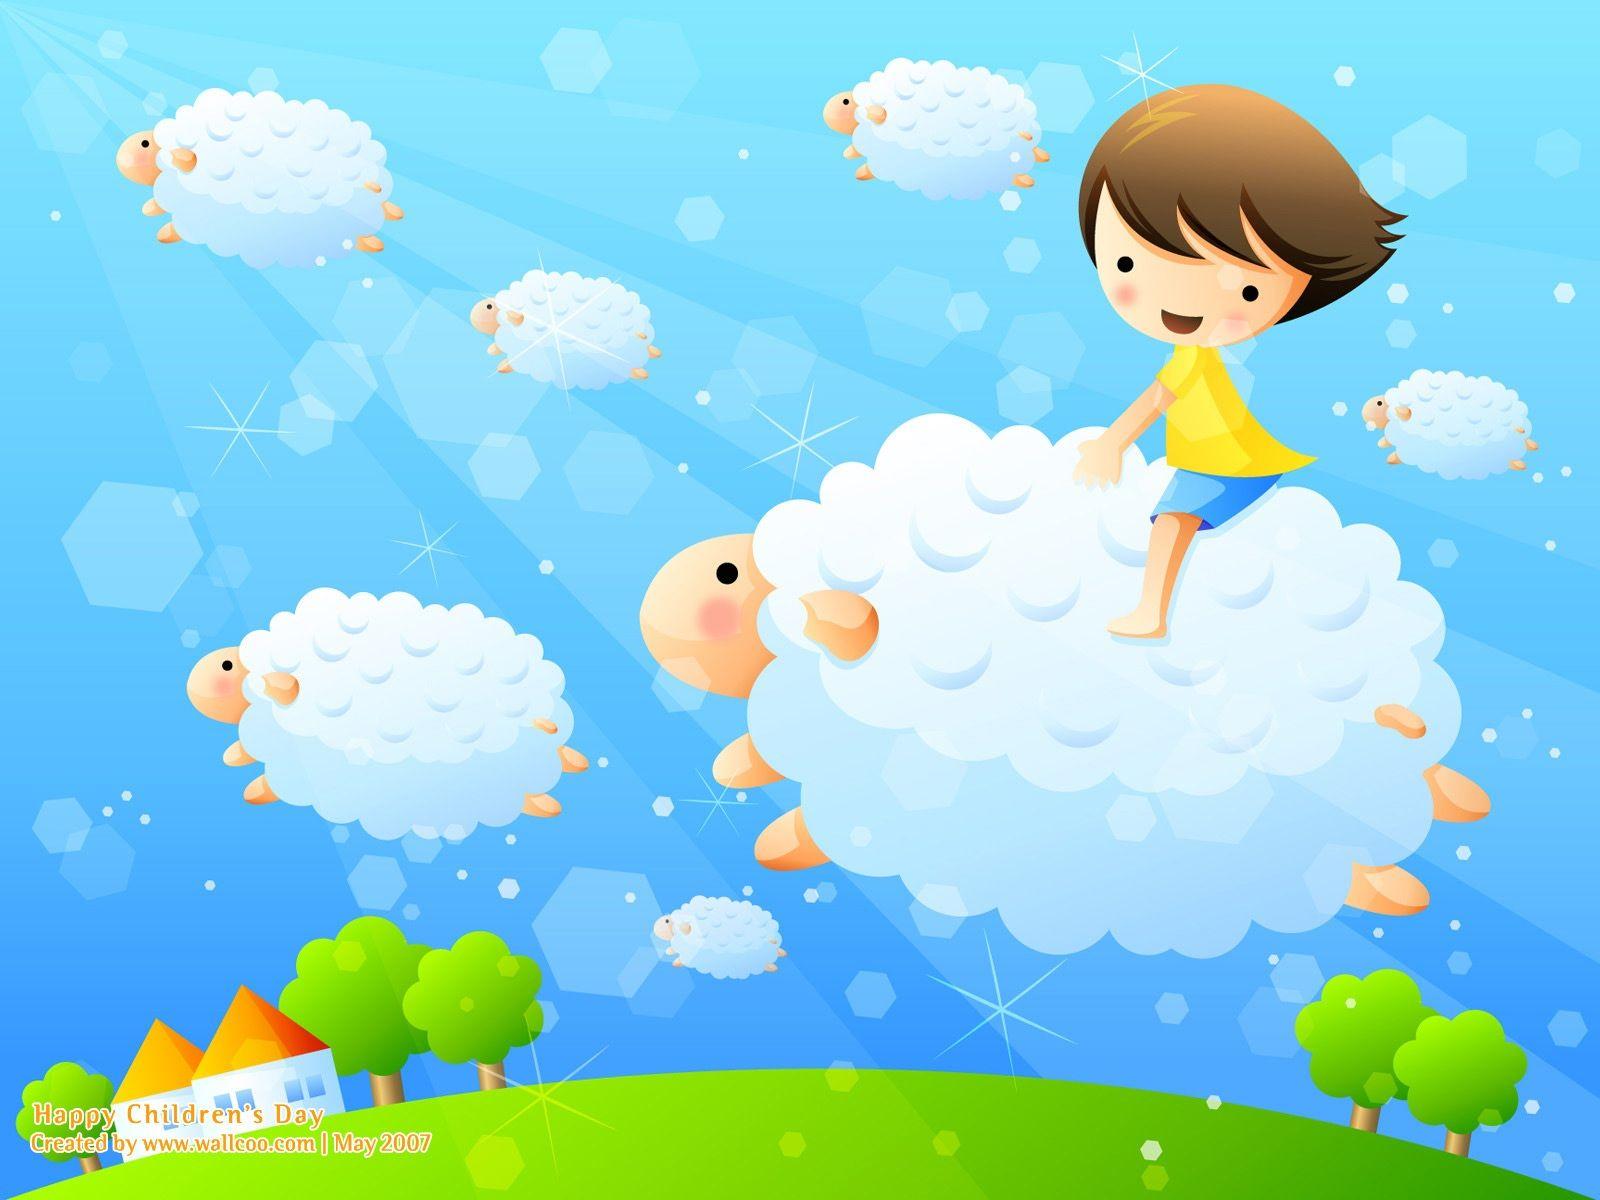 desktop backgrounds for kids 16001200 High Definition Wallpaper 1600x1200